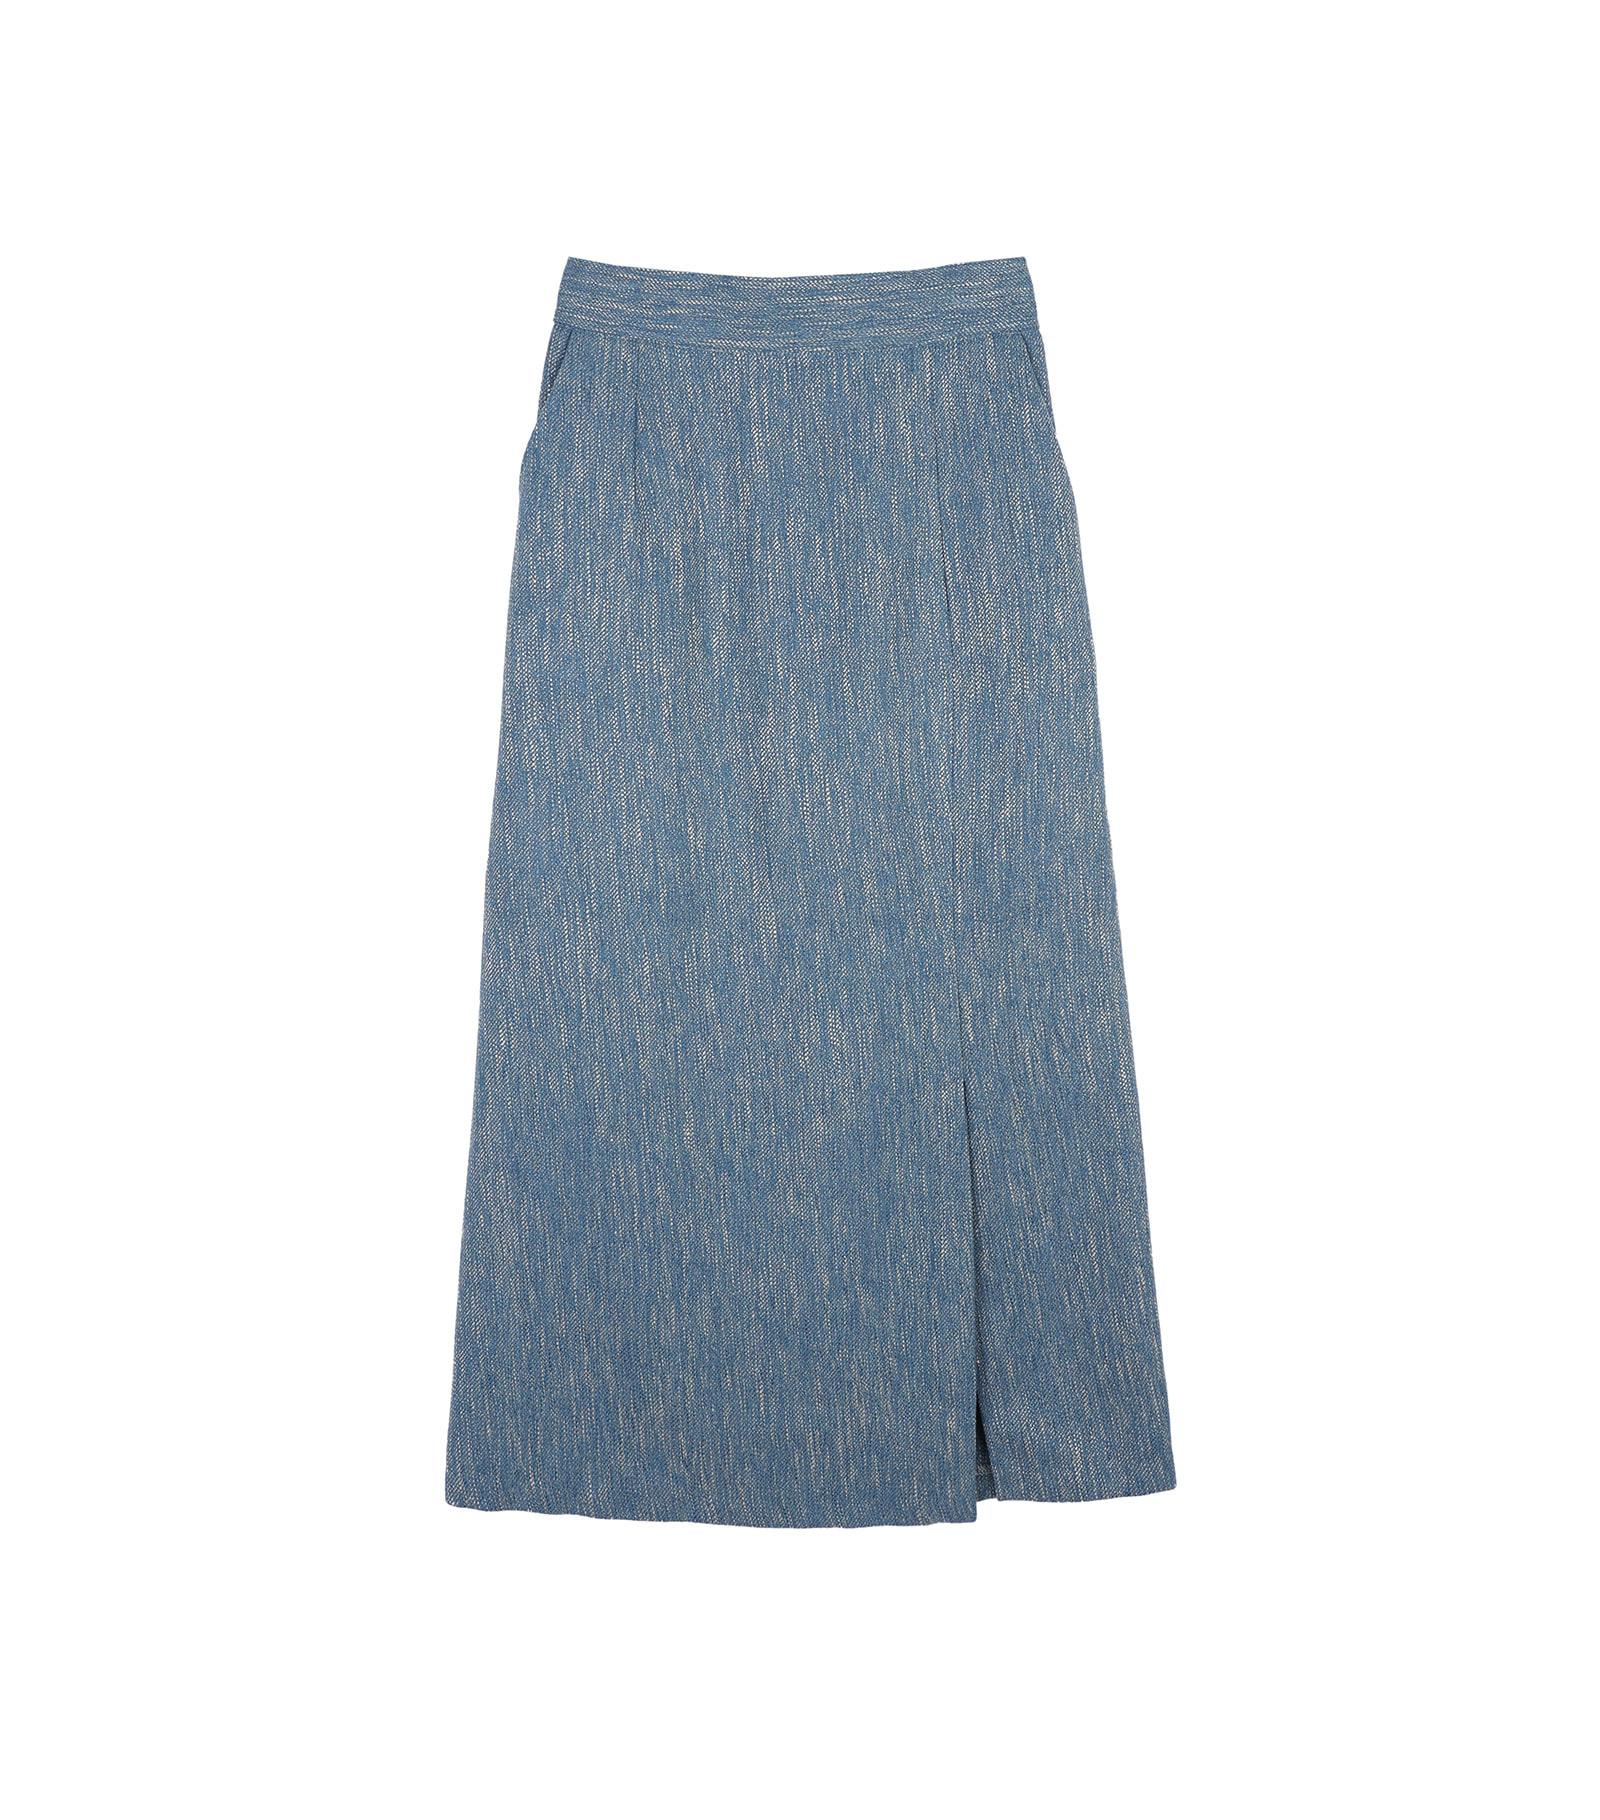 Croquis maxi skirt